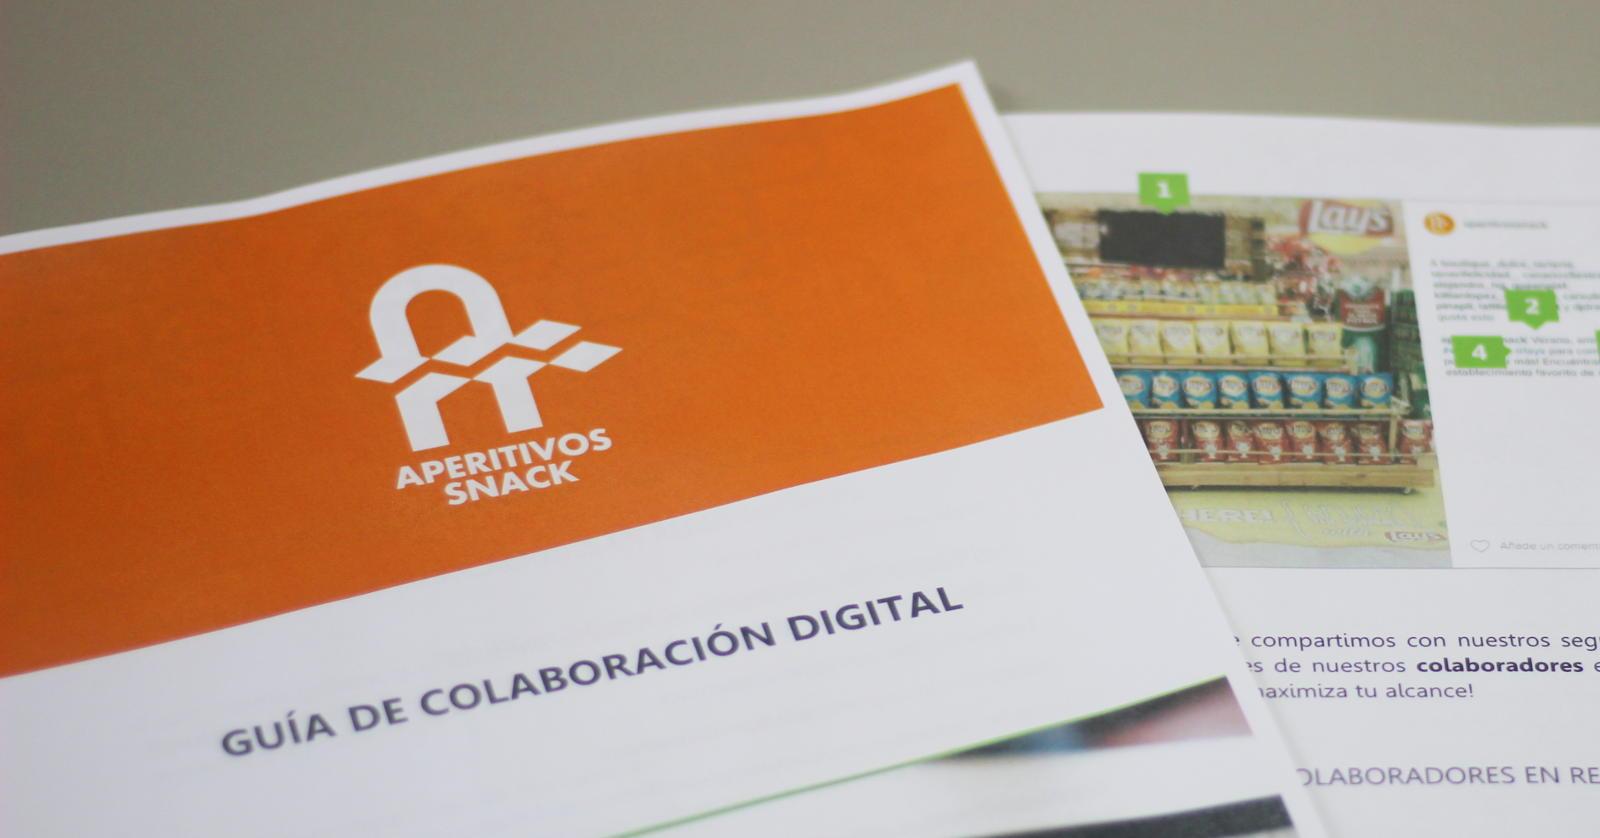 Guía de colaboración digital ASSA